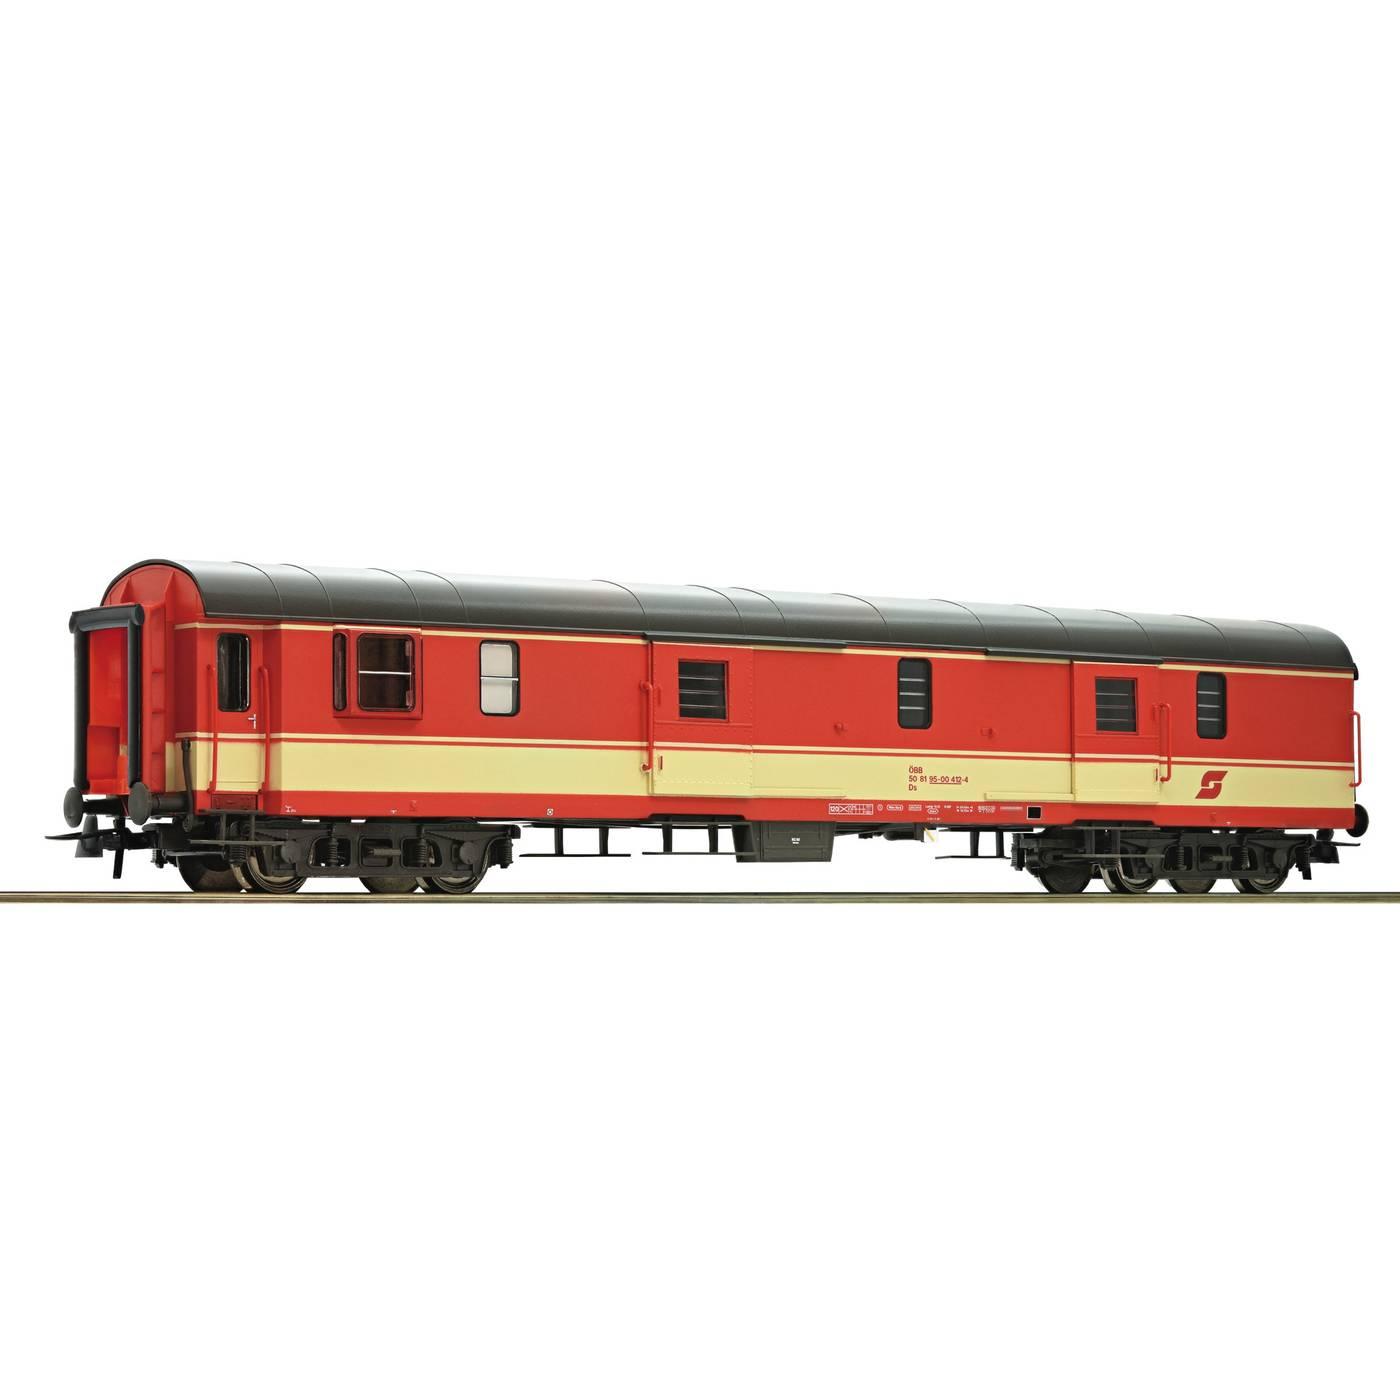 Roco64657 Coach OBB baggage car